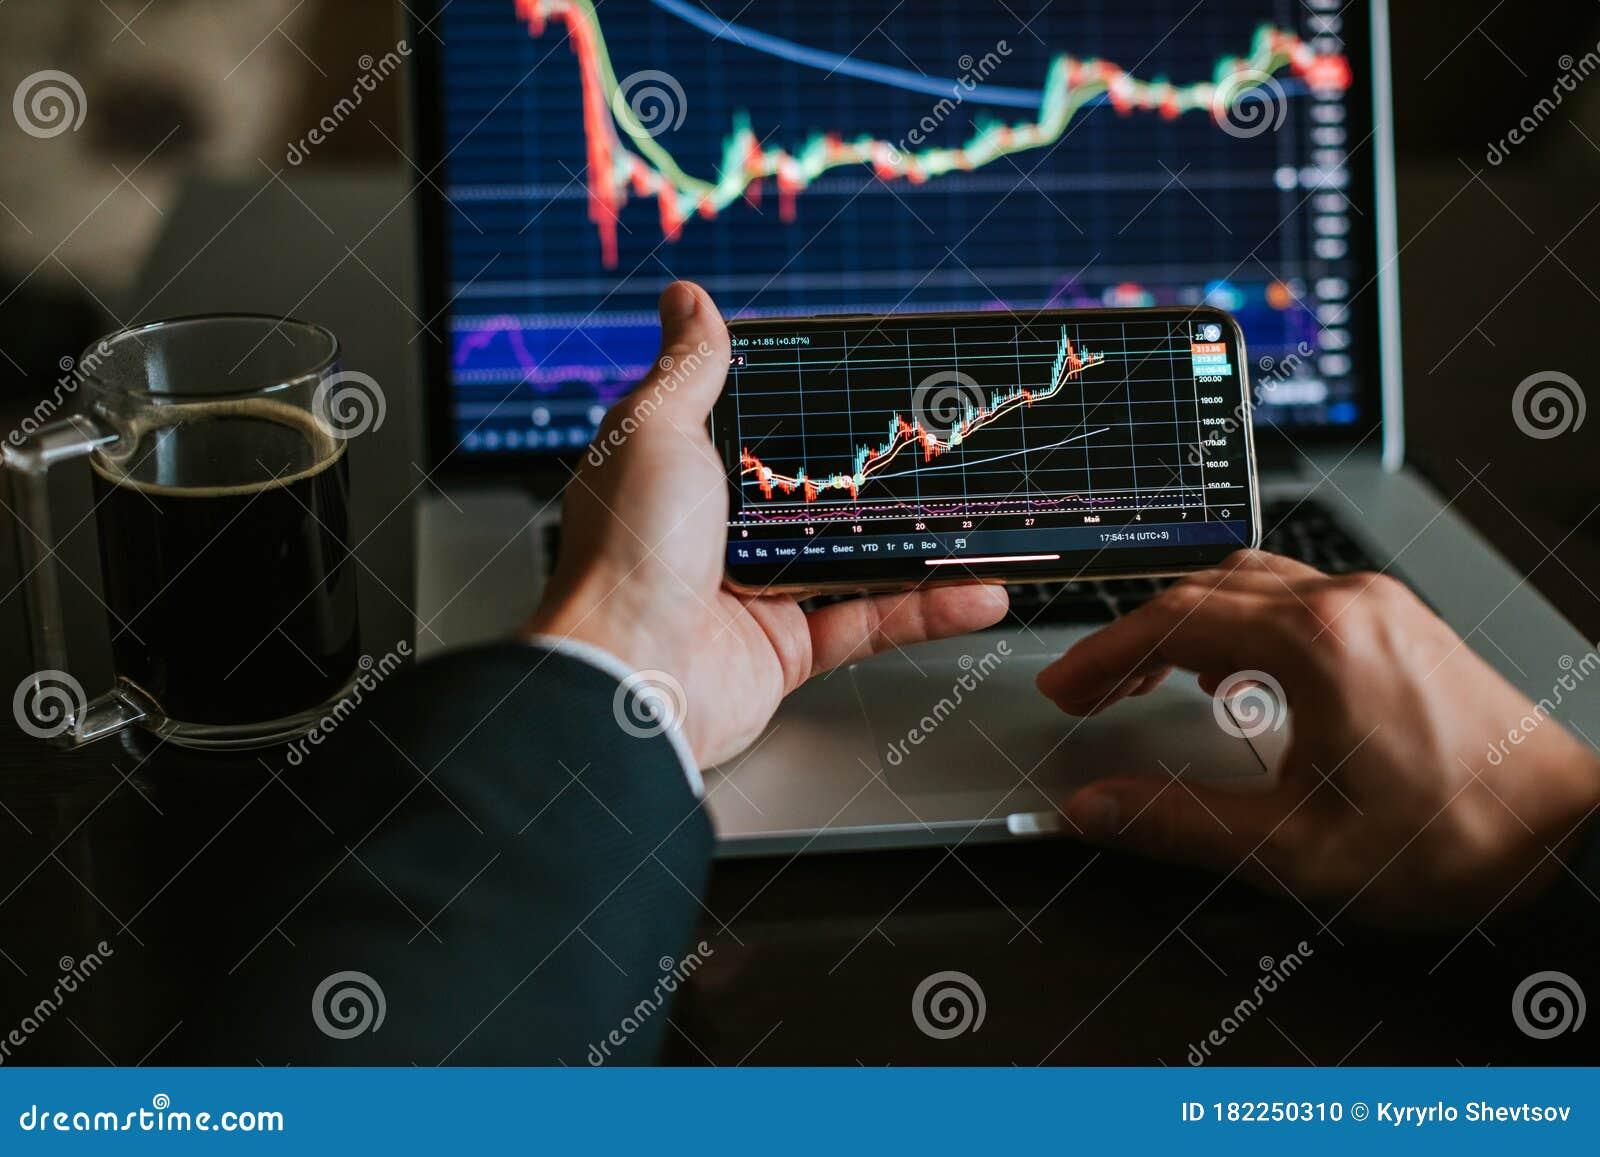 bitcoin stockbrokers)